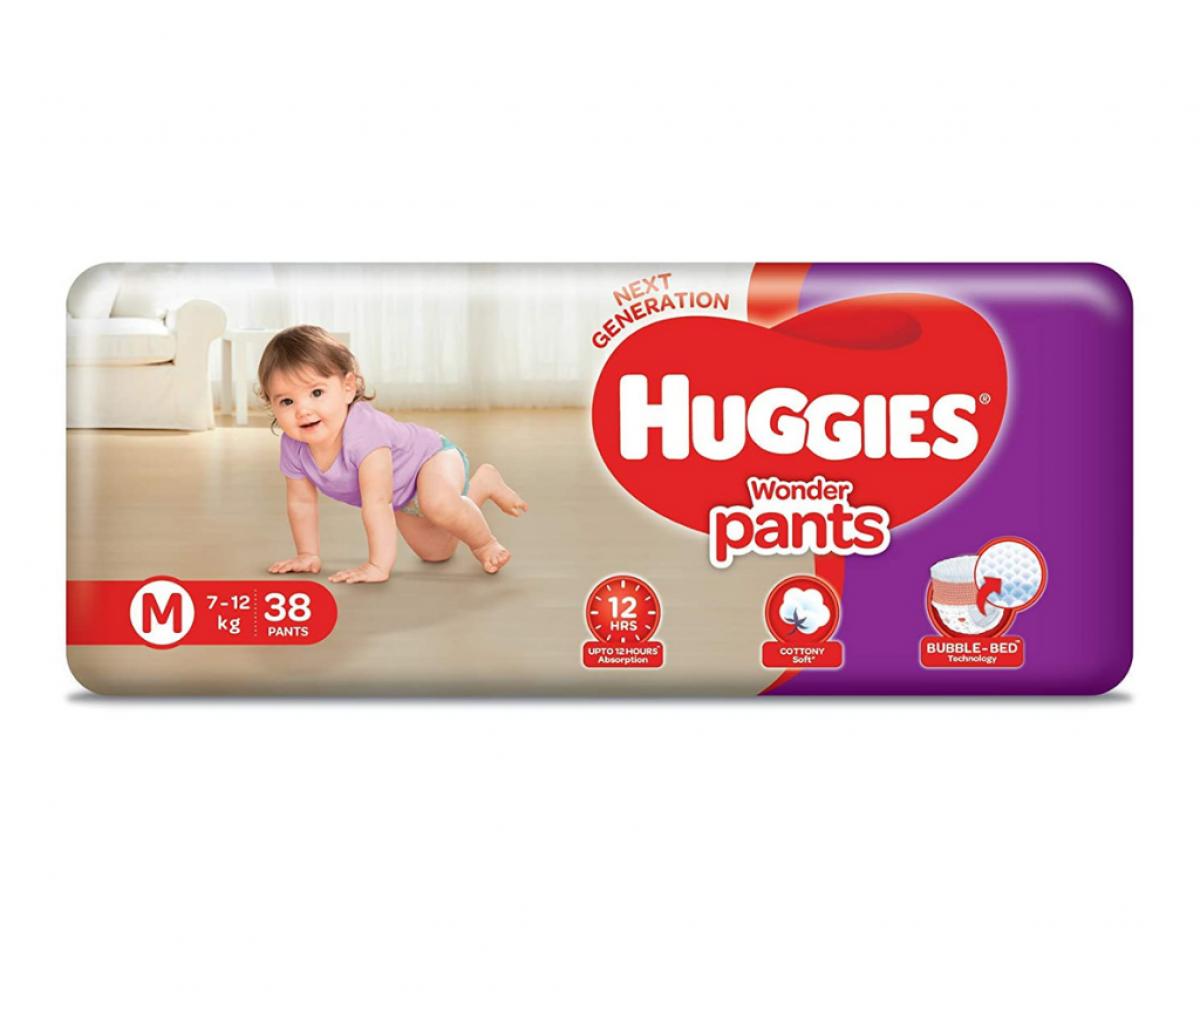 Huggies Wonder Pants Medium 38's